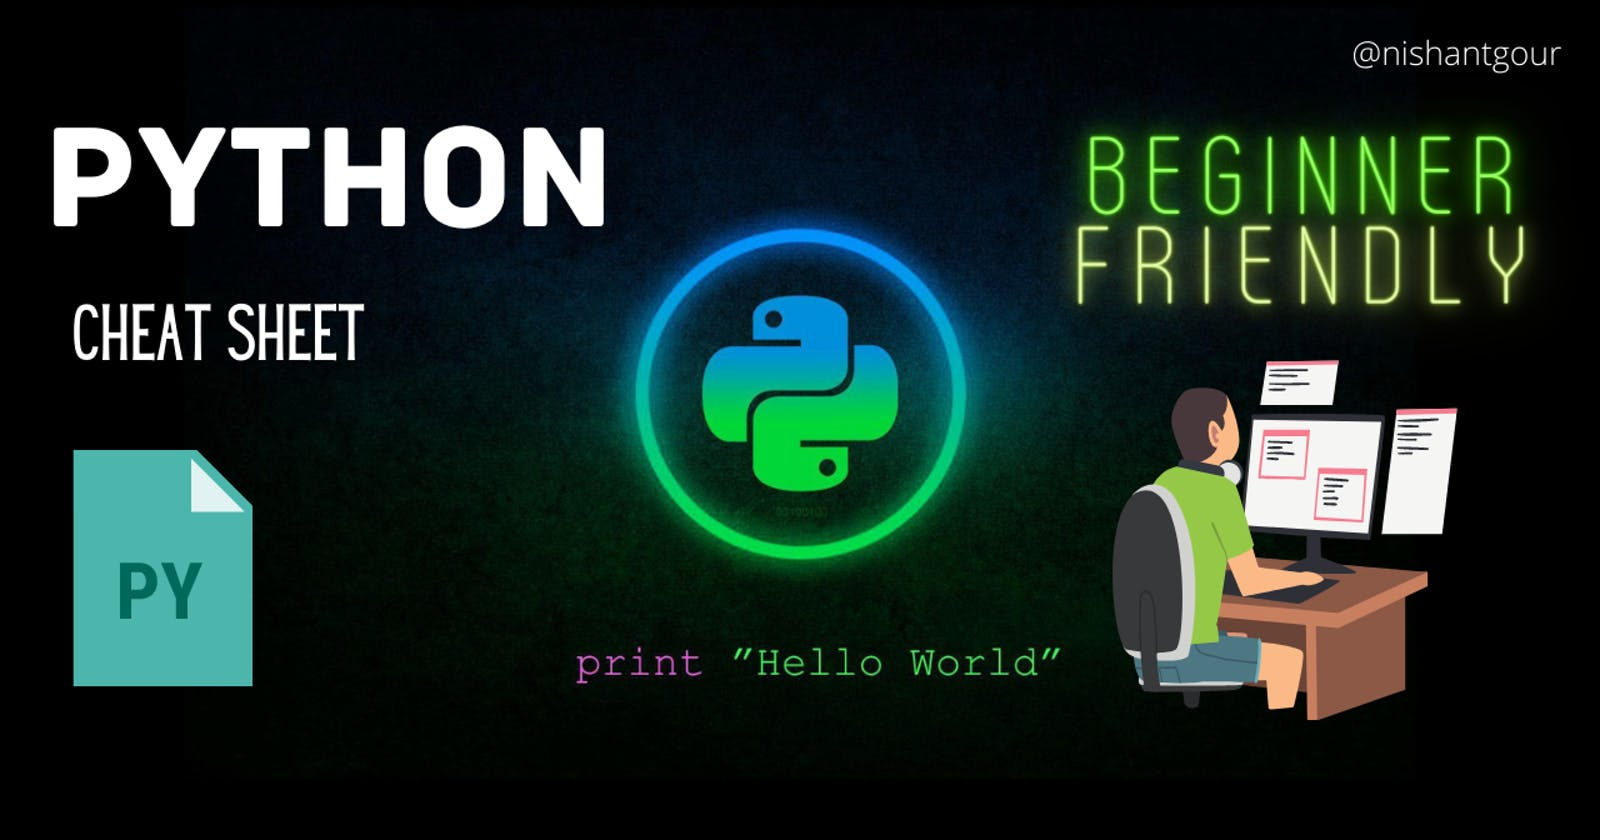 Python Cheat Sheet! For beginners